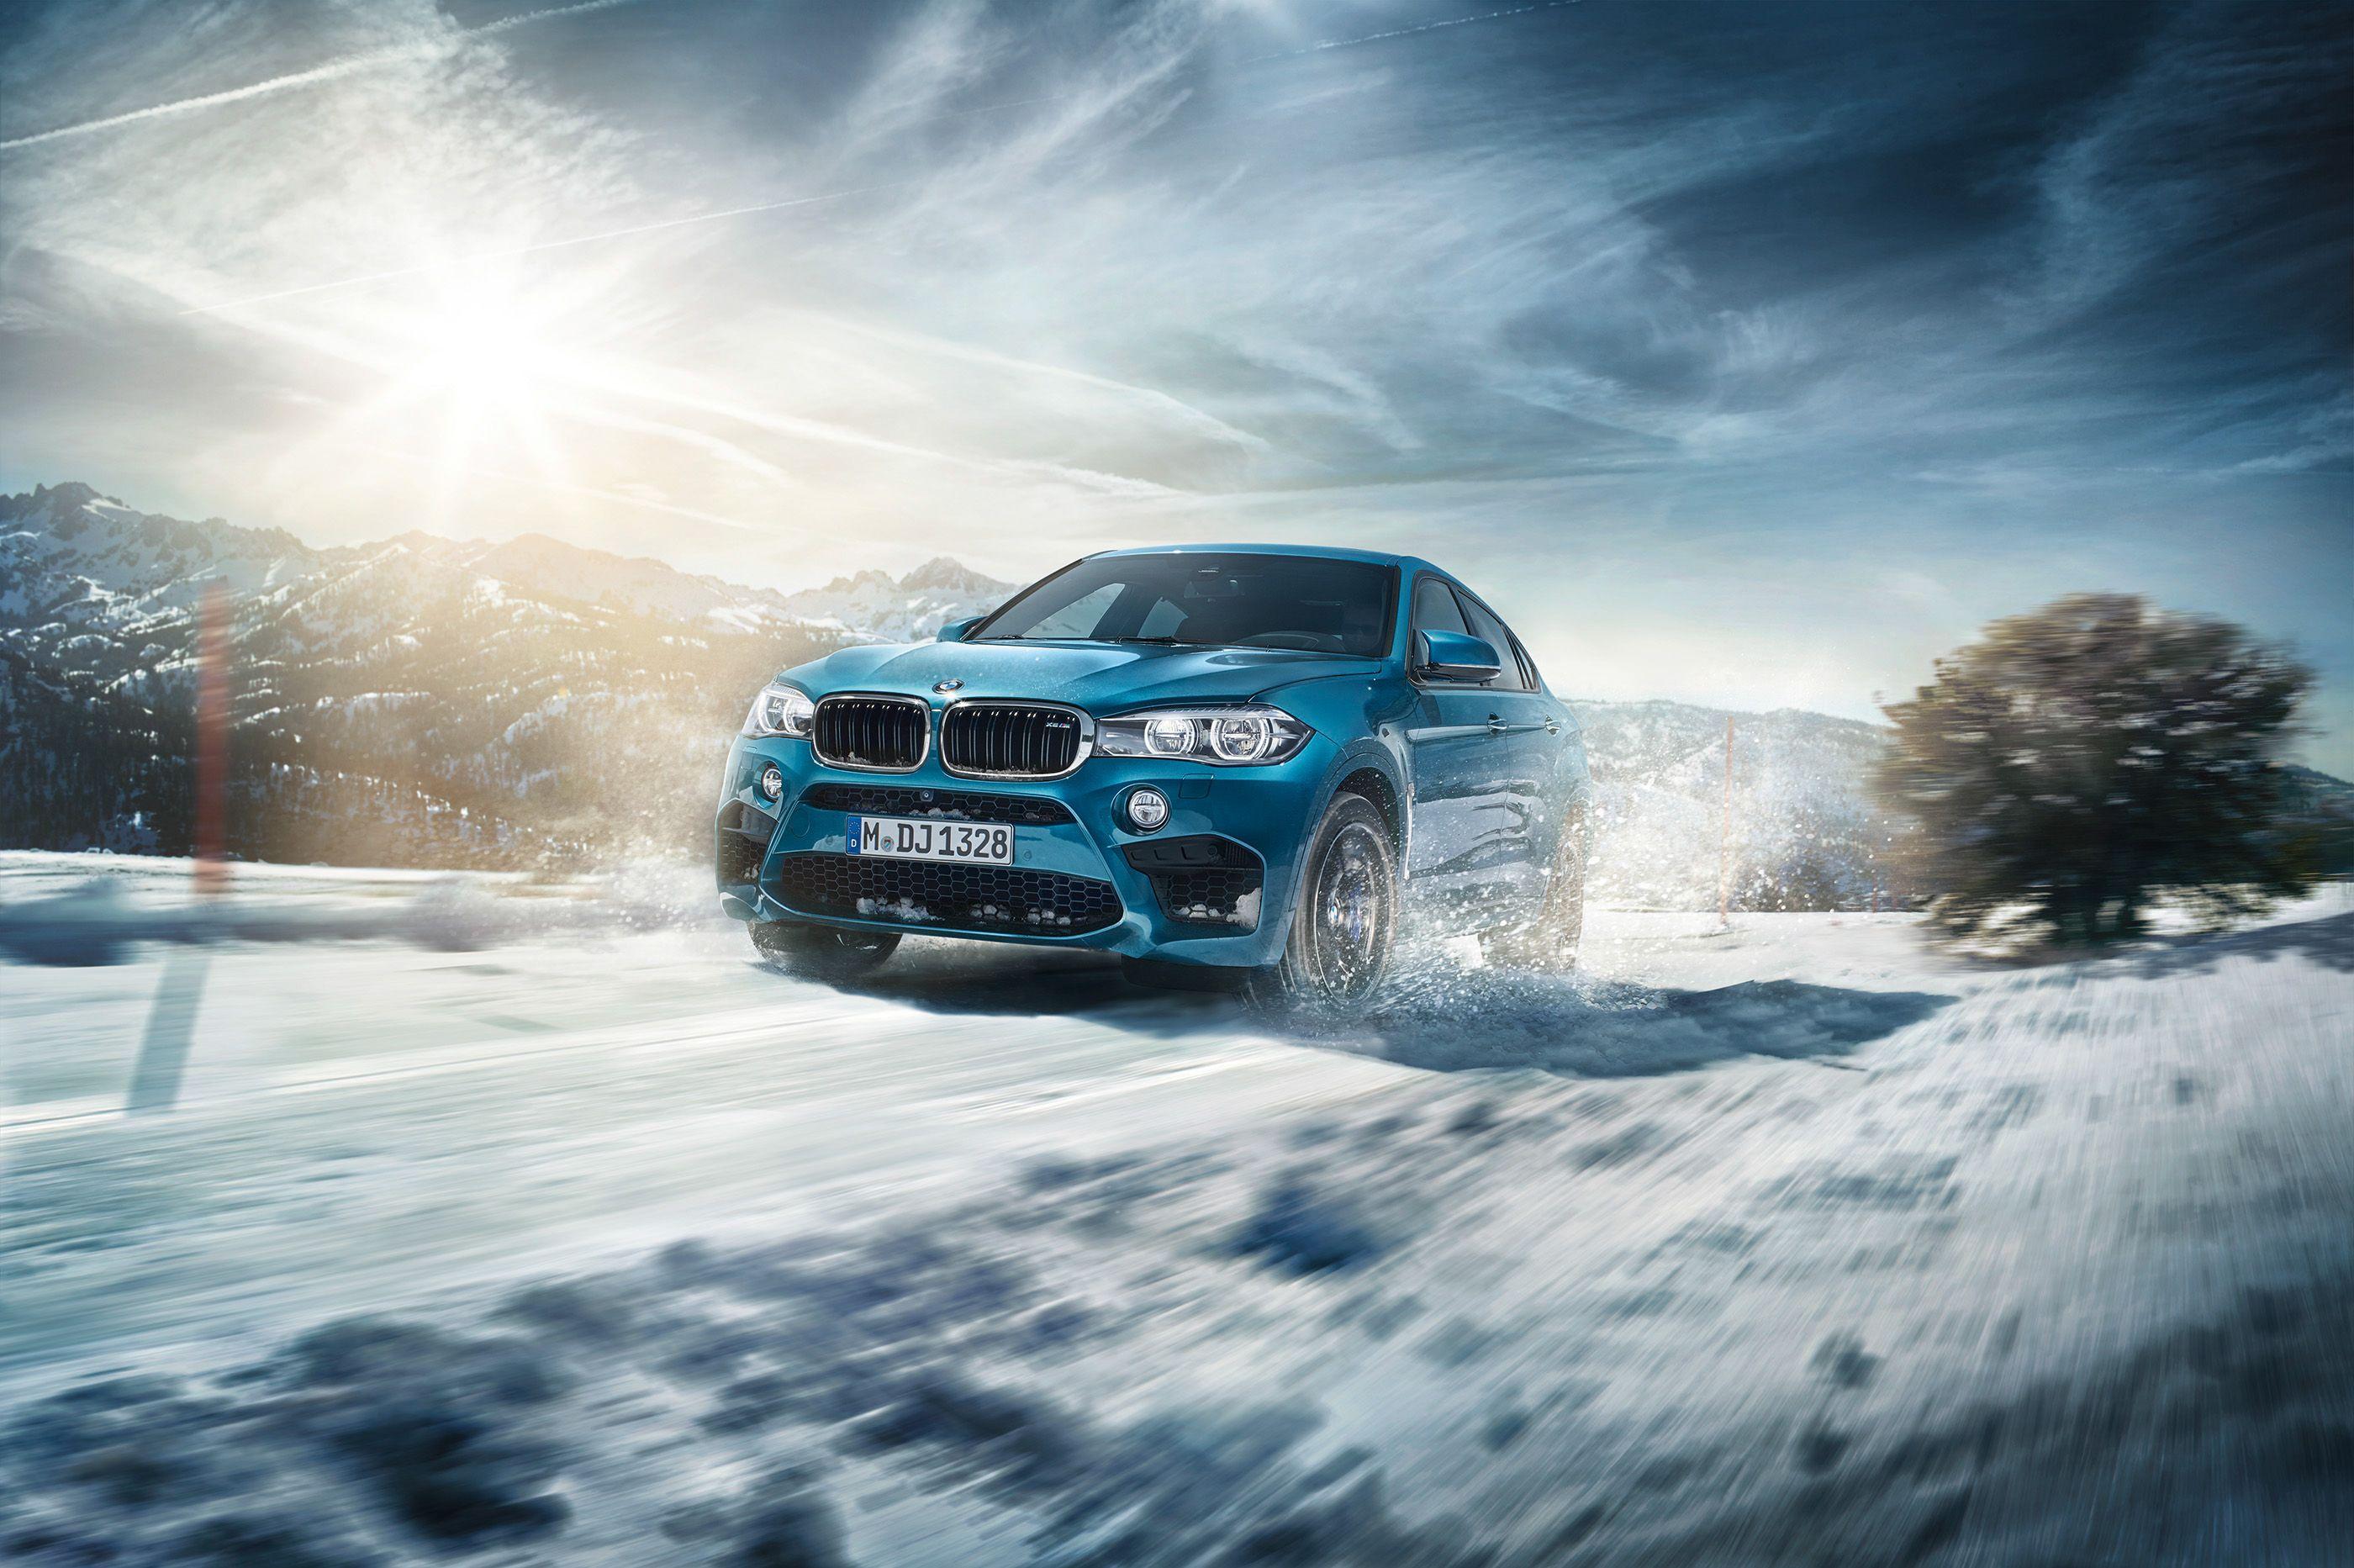 查看此 @Behance 项目: \u201cPostproduction BMW xDrive Campagne\u201d https://www.behance.net/gallery/47337839/Postproduction-BMW-xDrive-Campagne